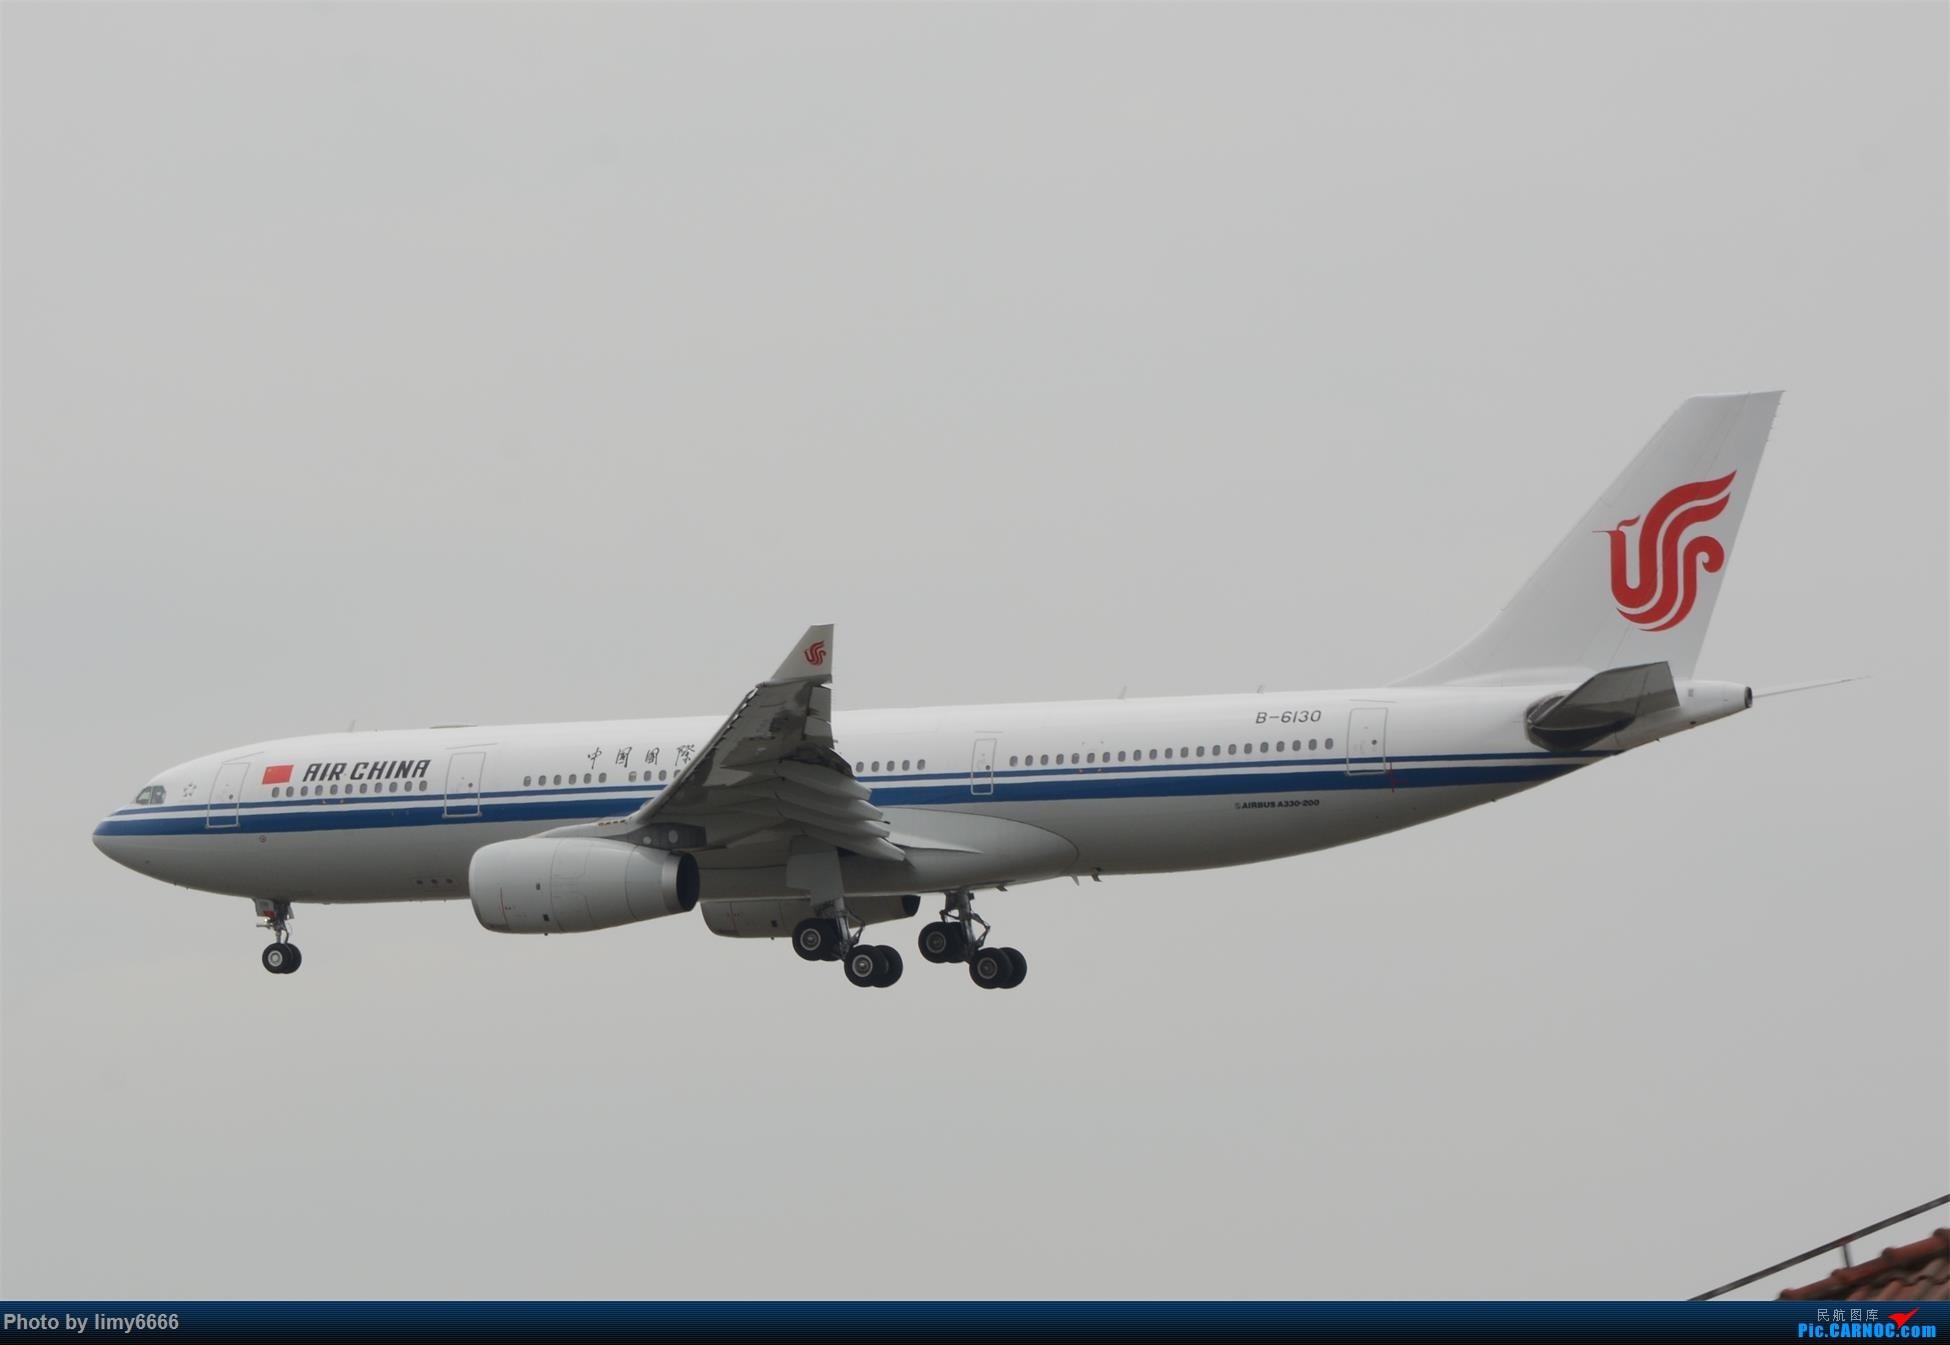 Re:[原创]上海虹桥机场拍机(在贵阳很少见或看不见的) AIRBUS A330-200 B-6130 中国上海虹桥国际机场